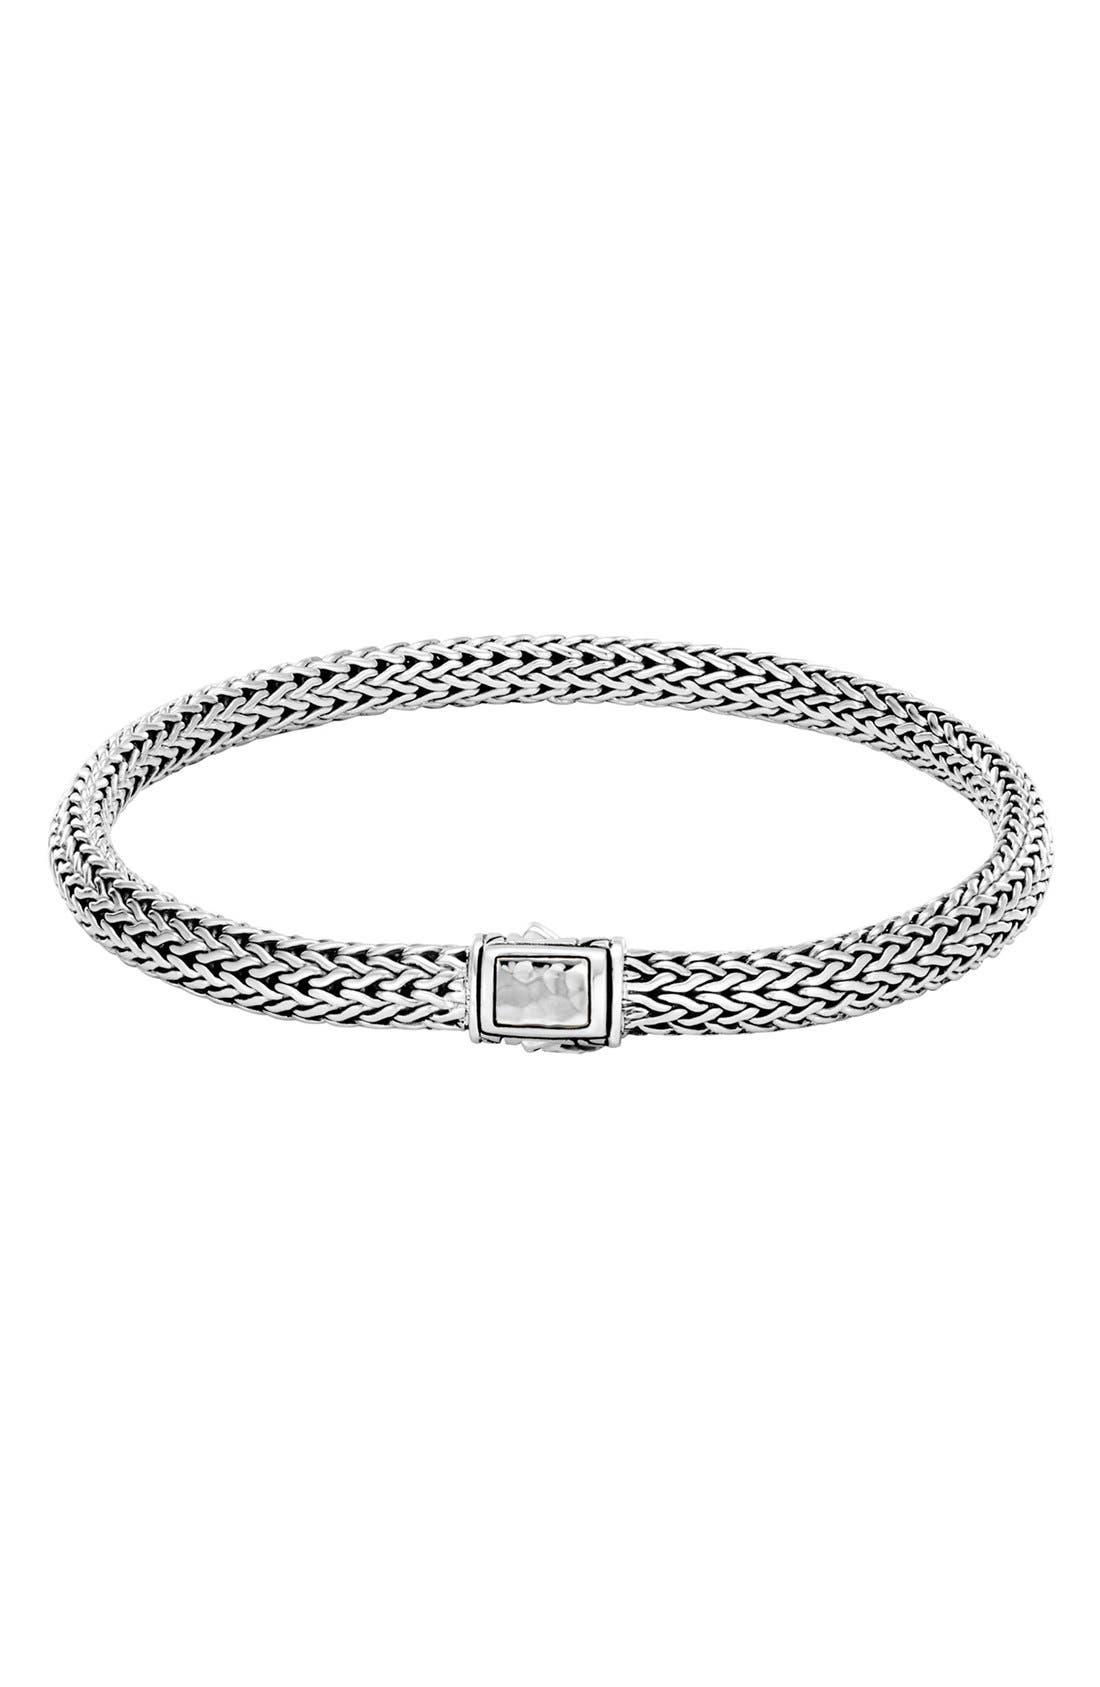 Main Image - John Hardy Classic Chain Hammered Clasp Bracelet